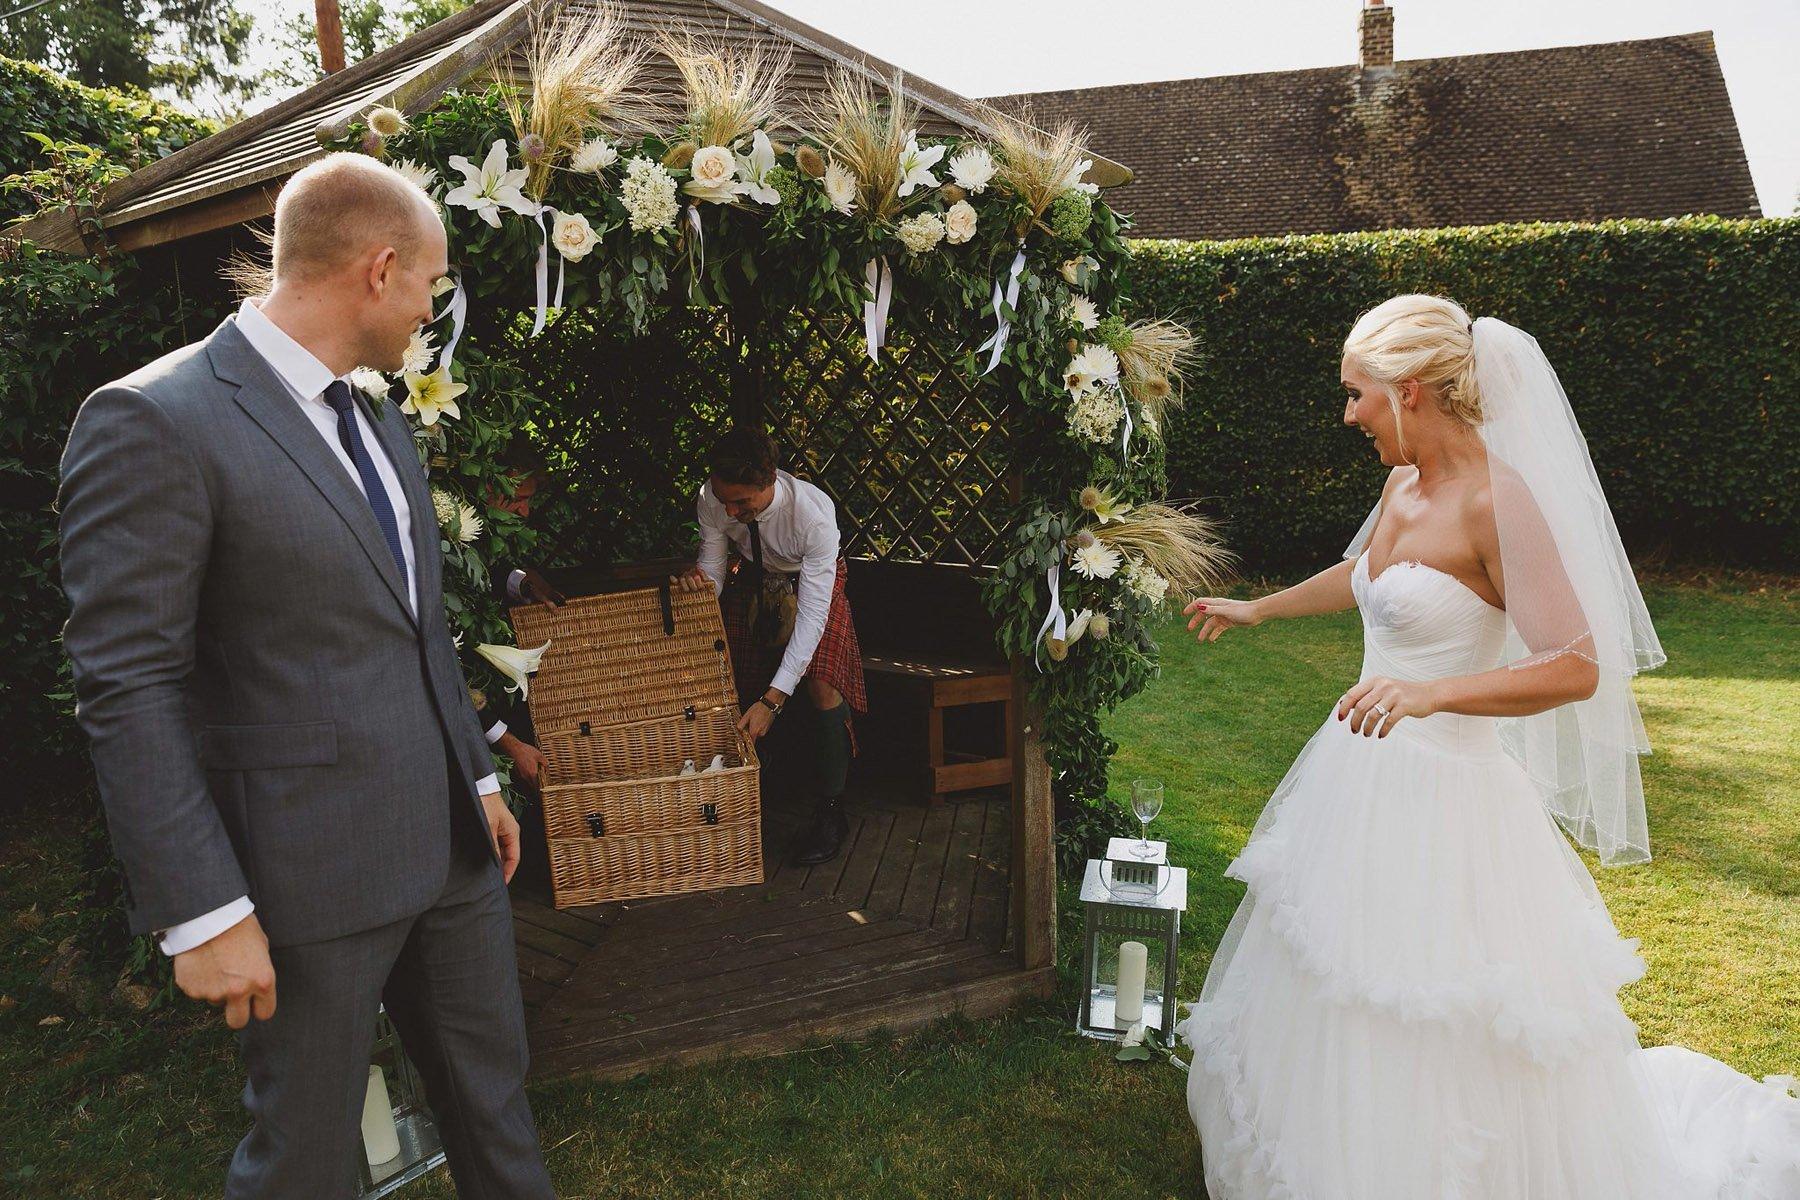 oxfordshire-wedding-photographer-041